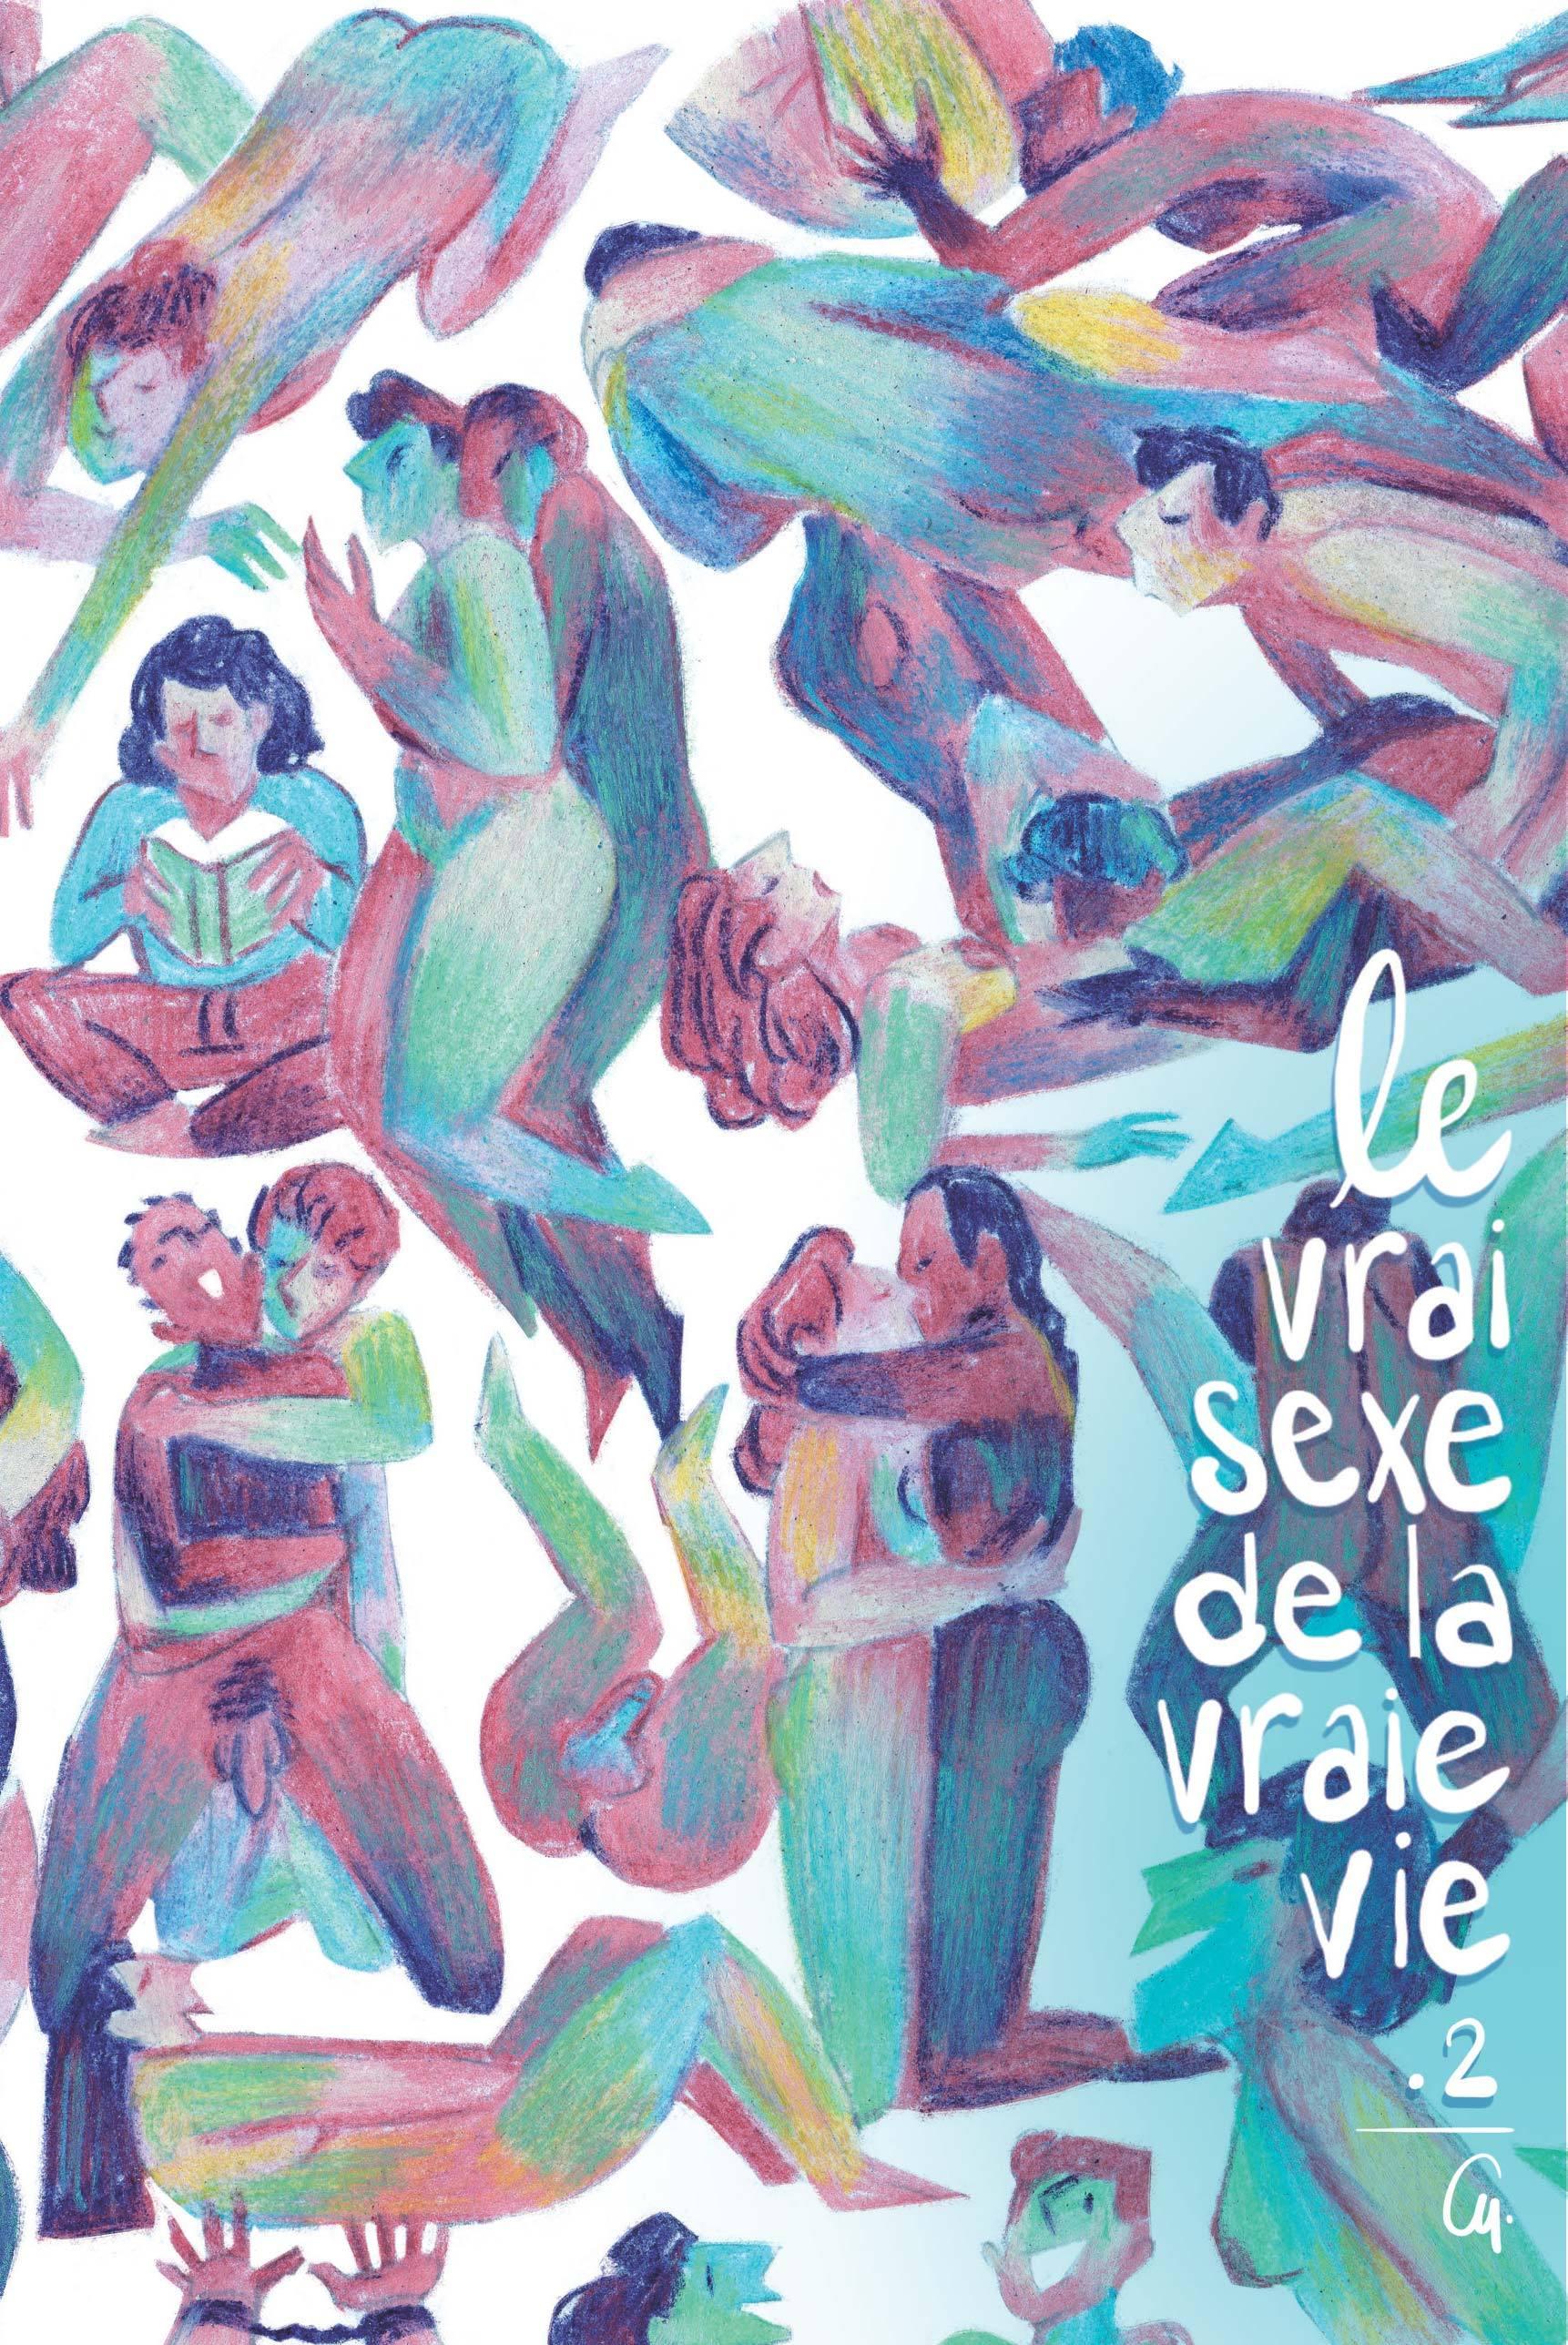 Galeries. de sexe de bande dessinée